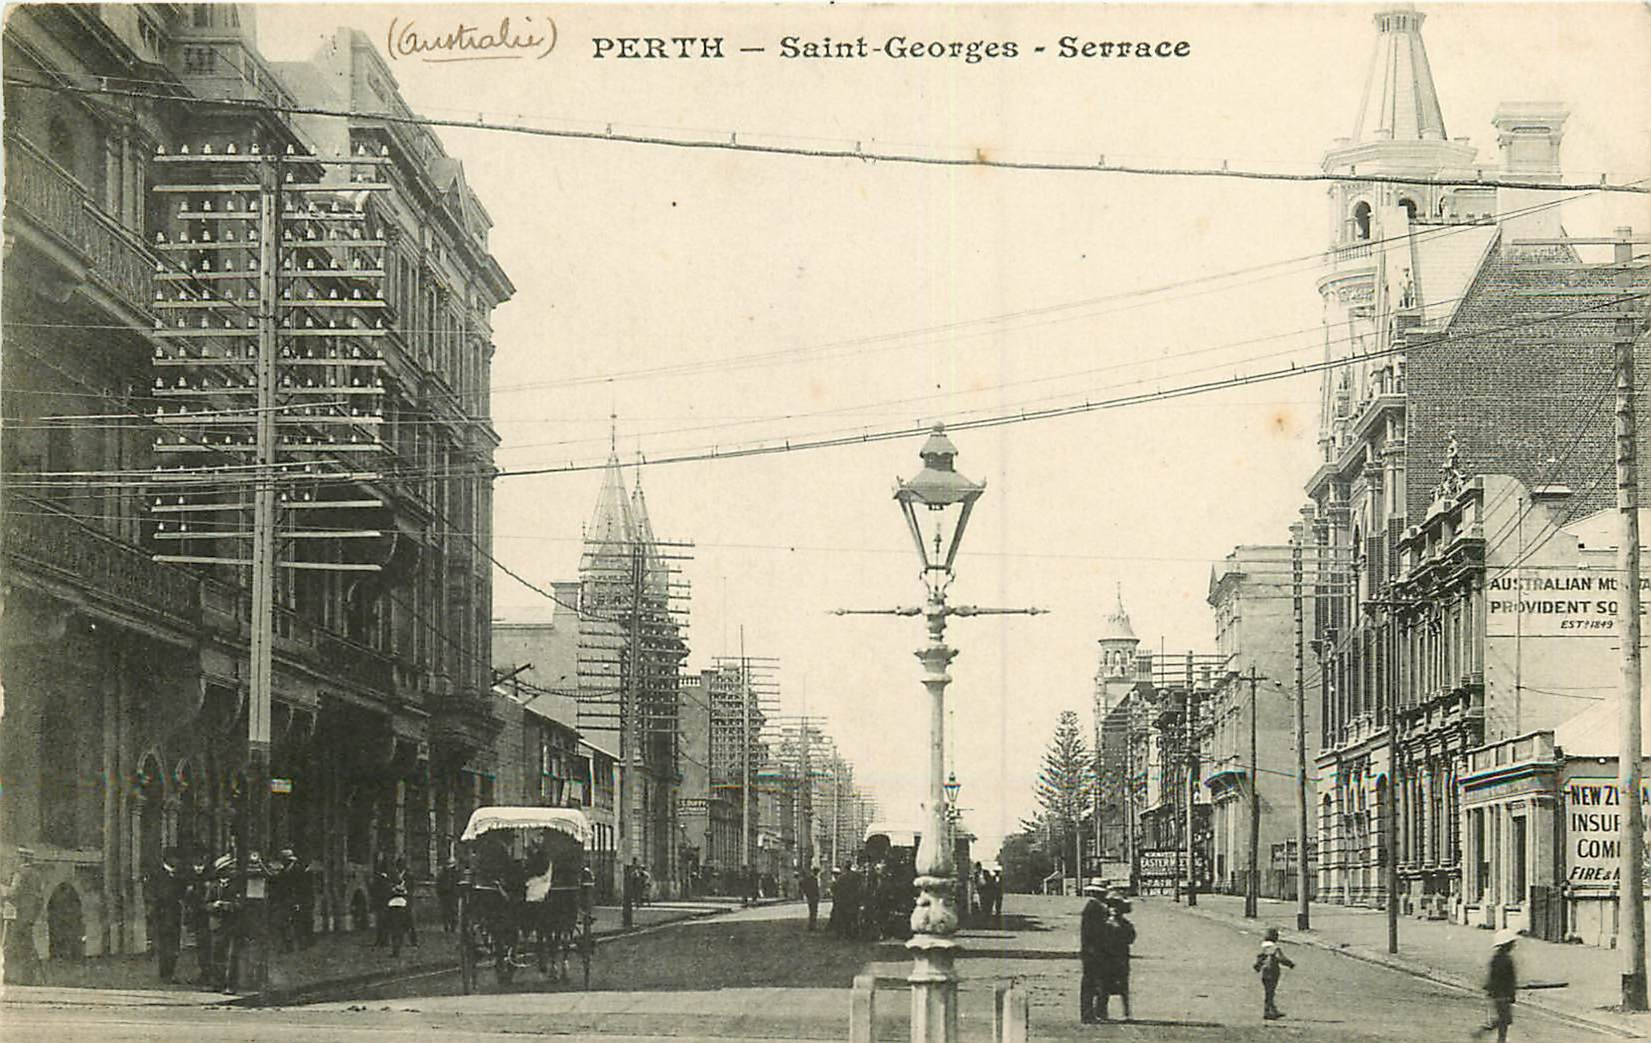 WW AUSTRALIE. Perth vers 1900. Saint-Georges Serrace